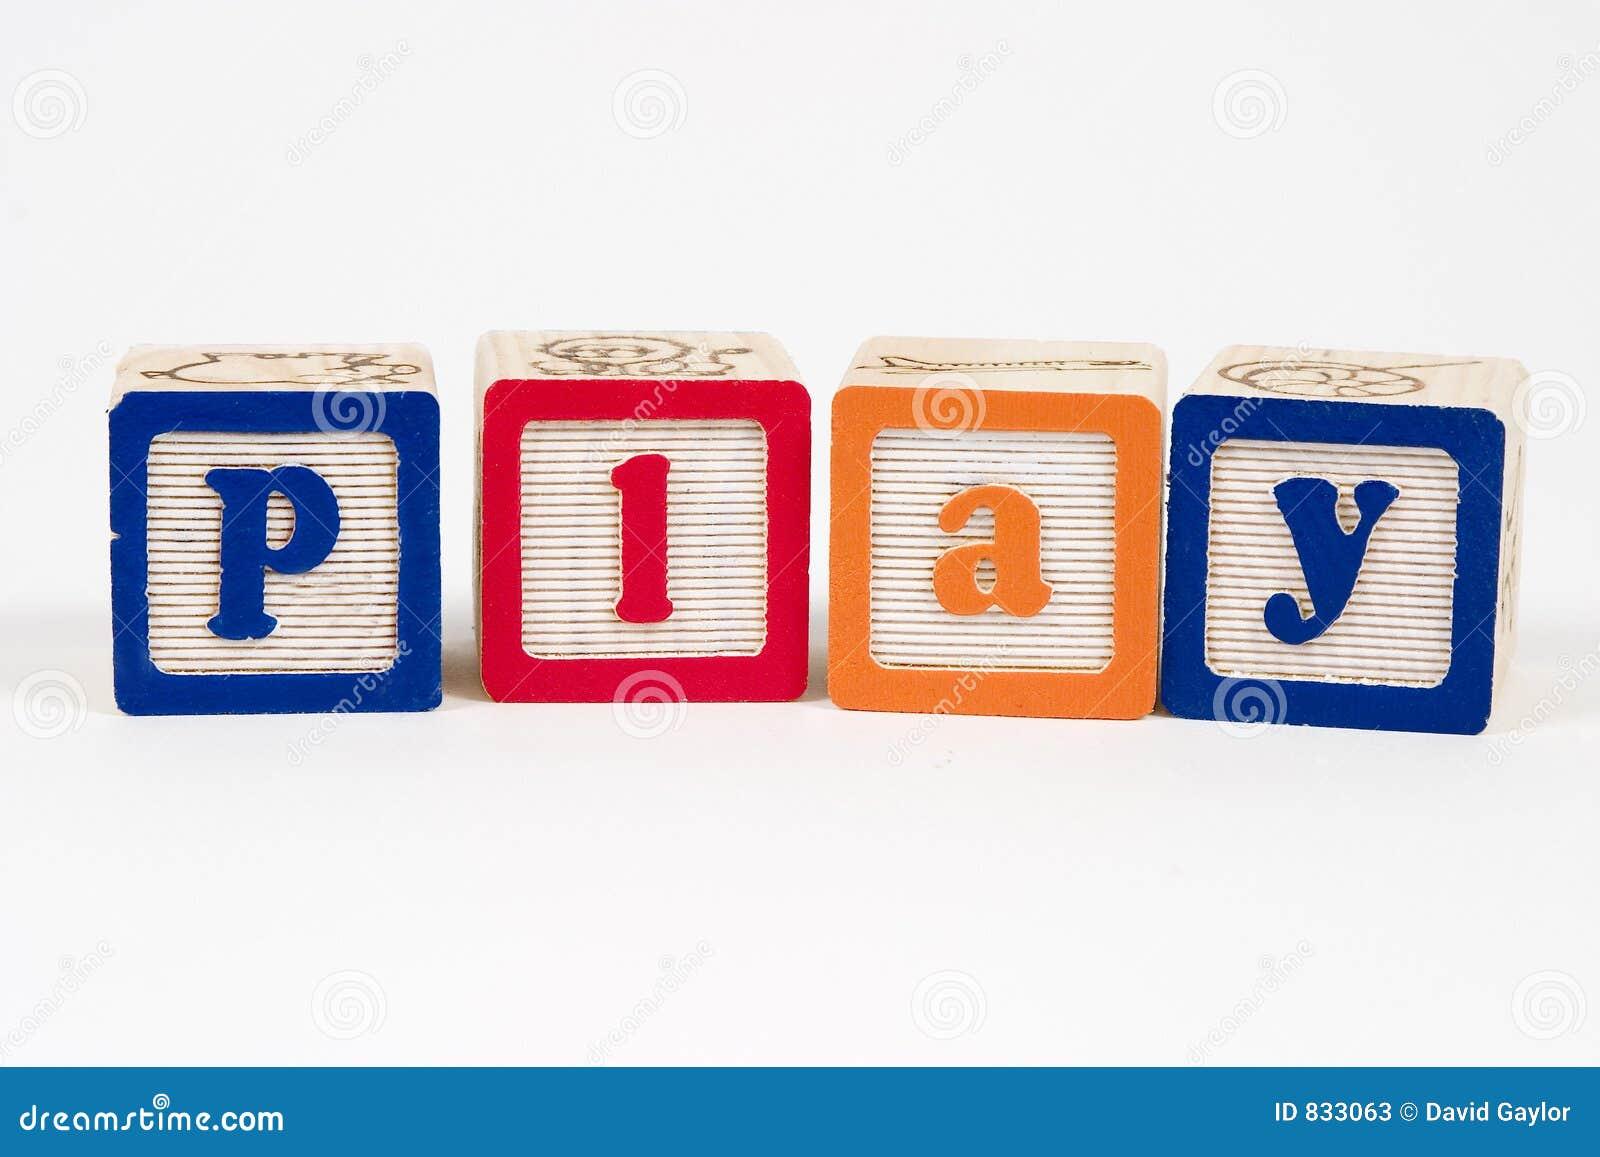 Play in blocks